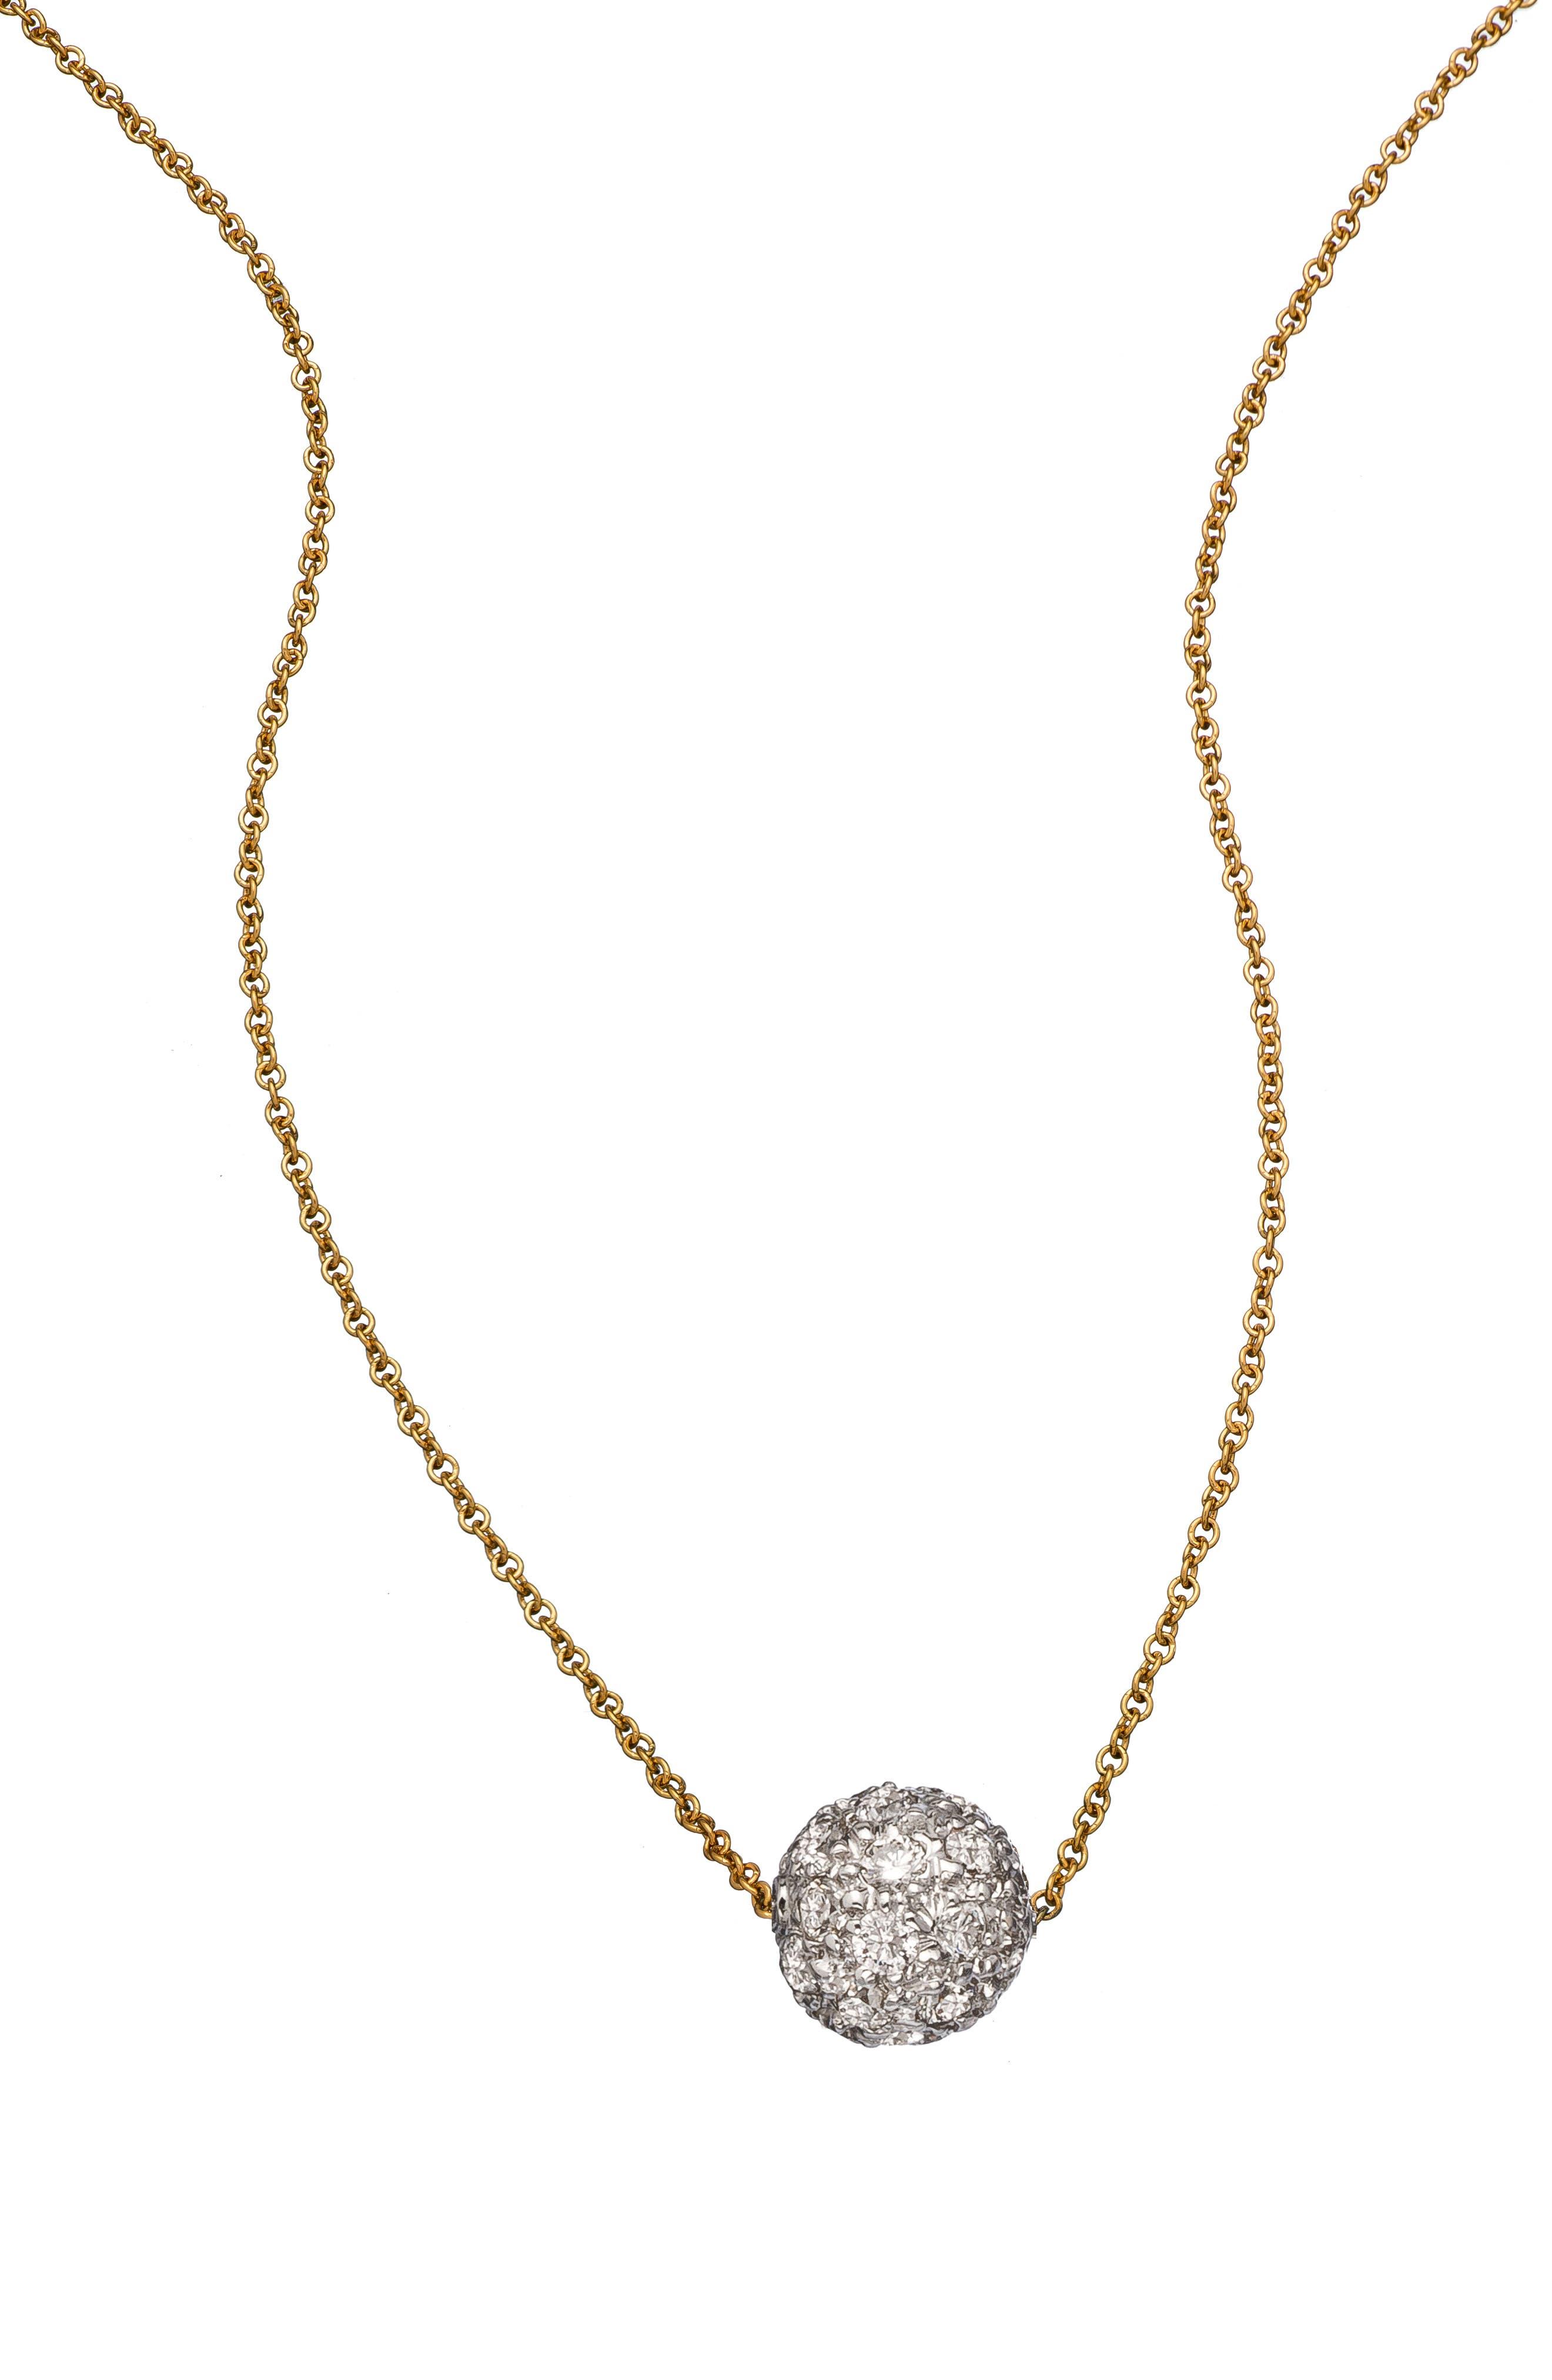 SETHI COUTURE Diamond Pave Ball Pendant Necklace in Yellow Gold/ Diamond